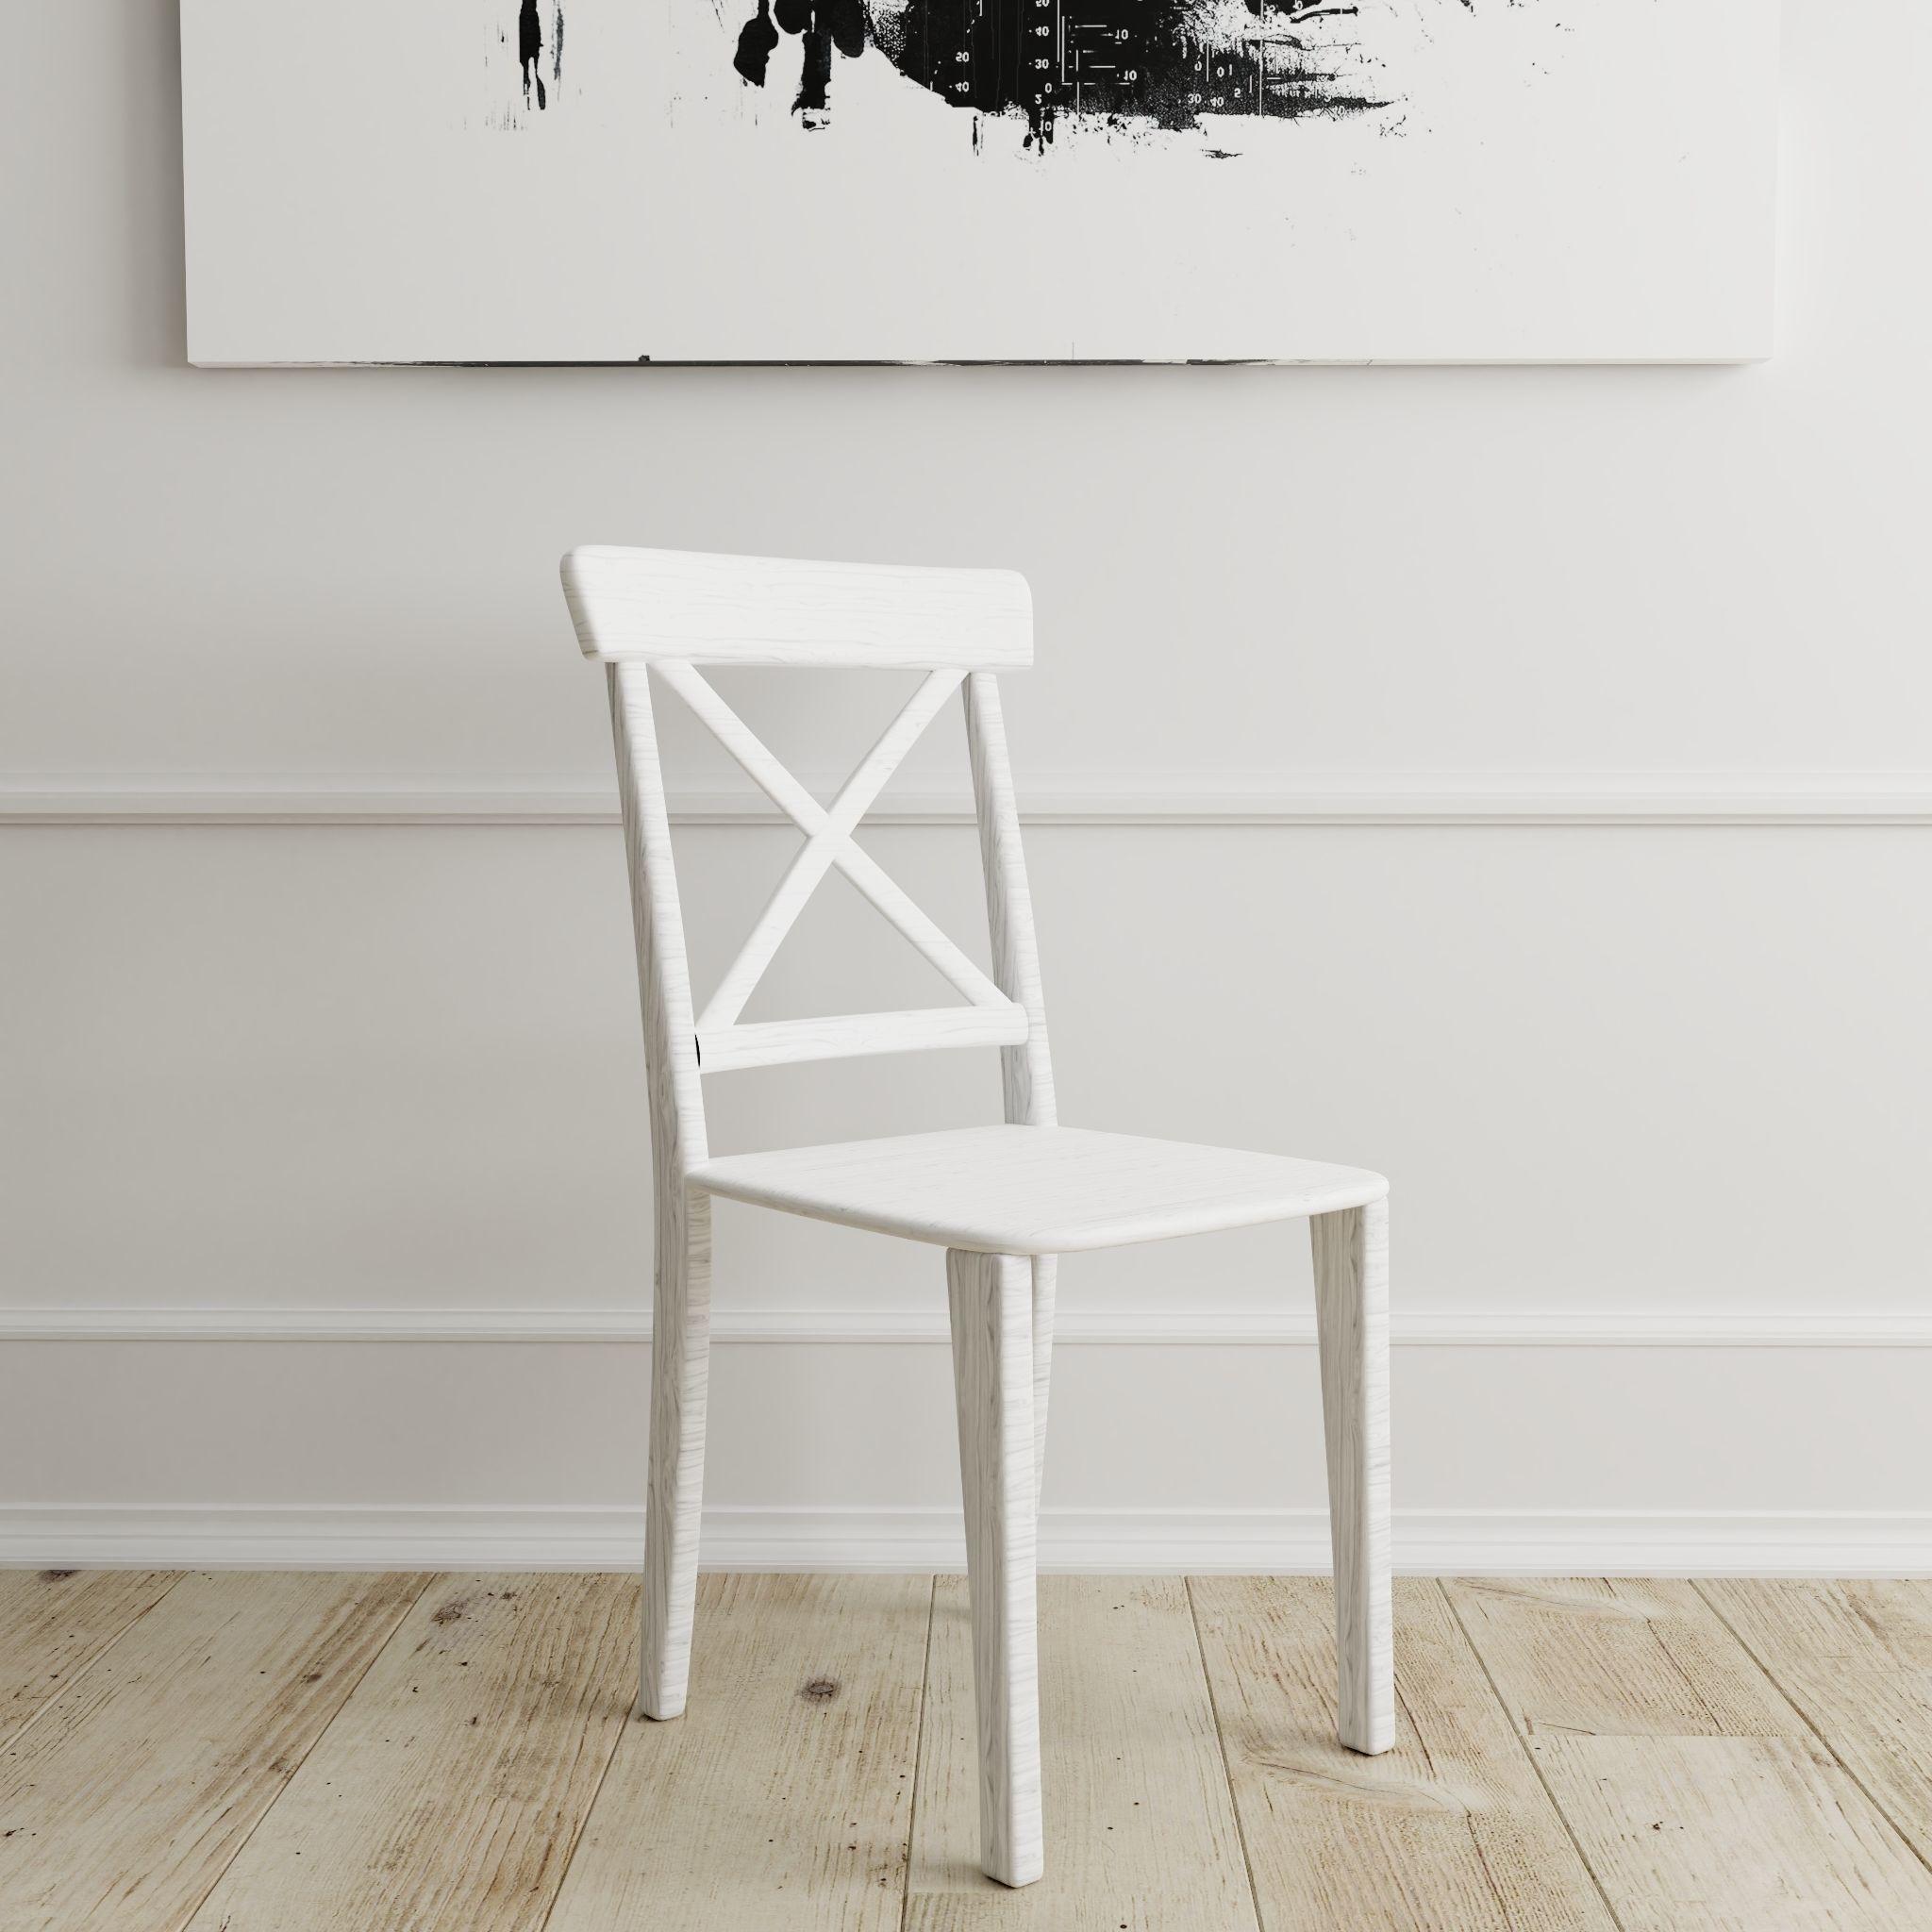 Chair American Wood - Photorealistic PBR